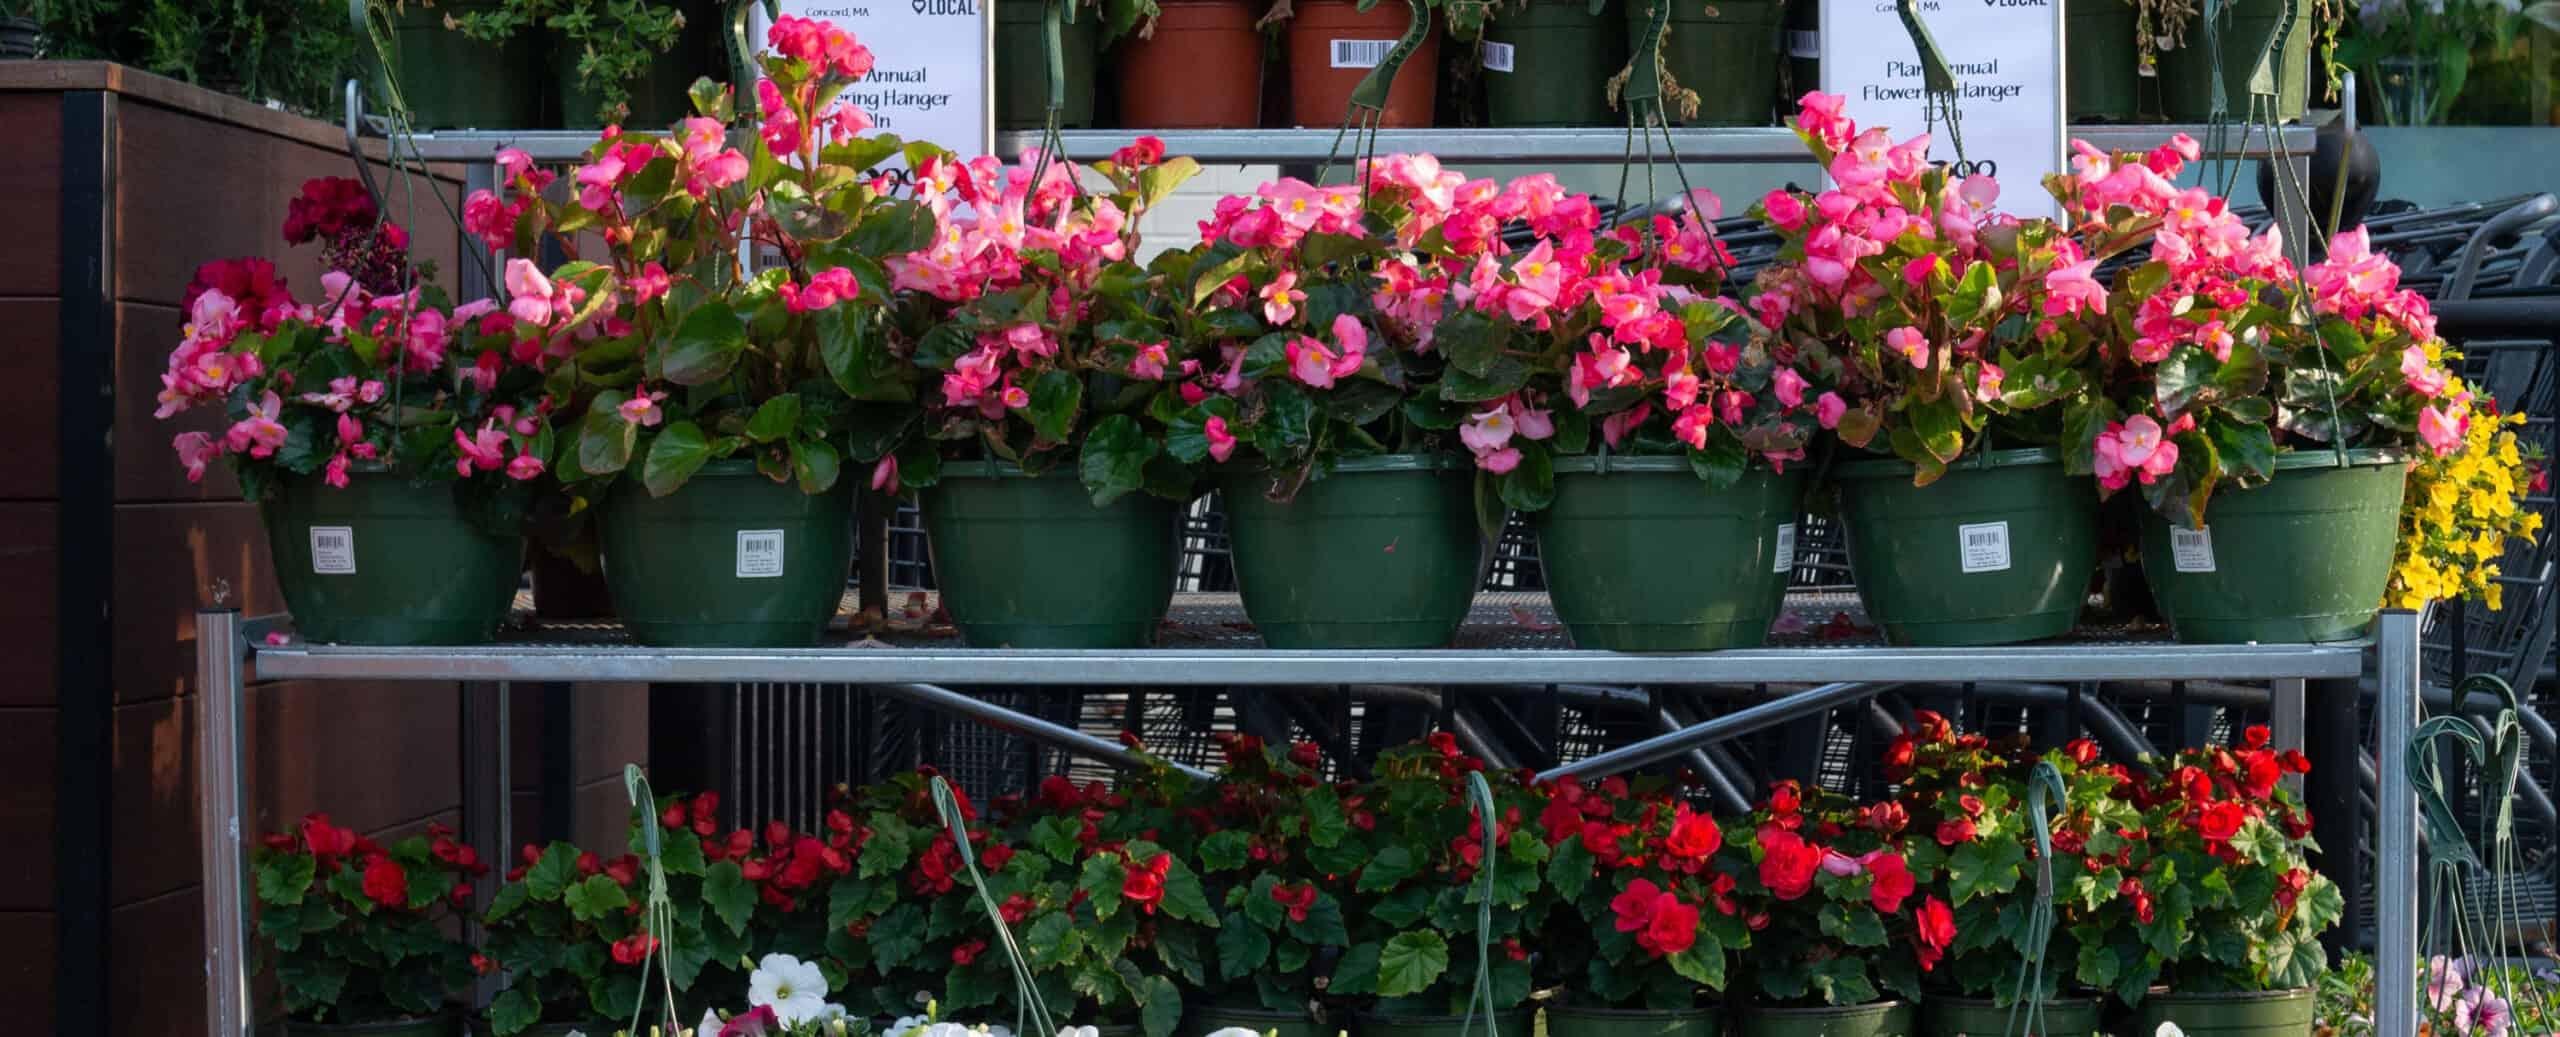 Flowers in a row Brookline